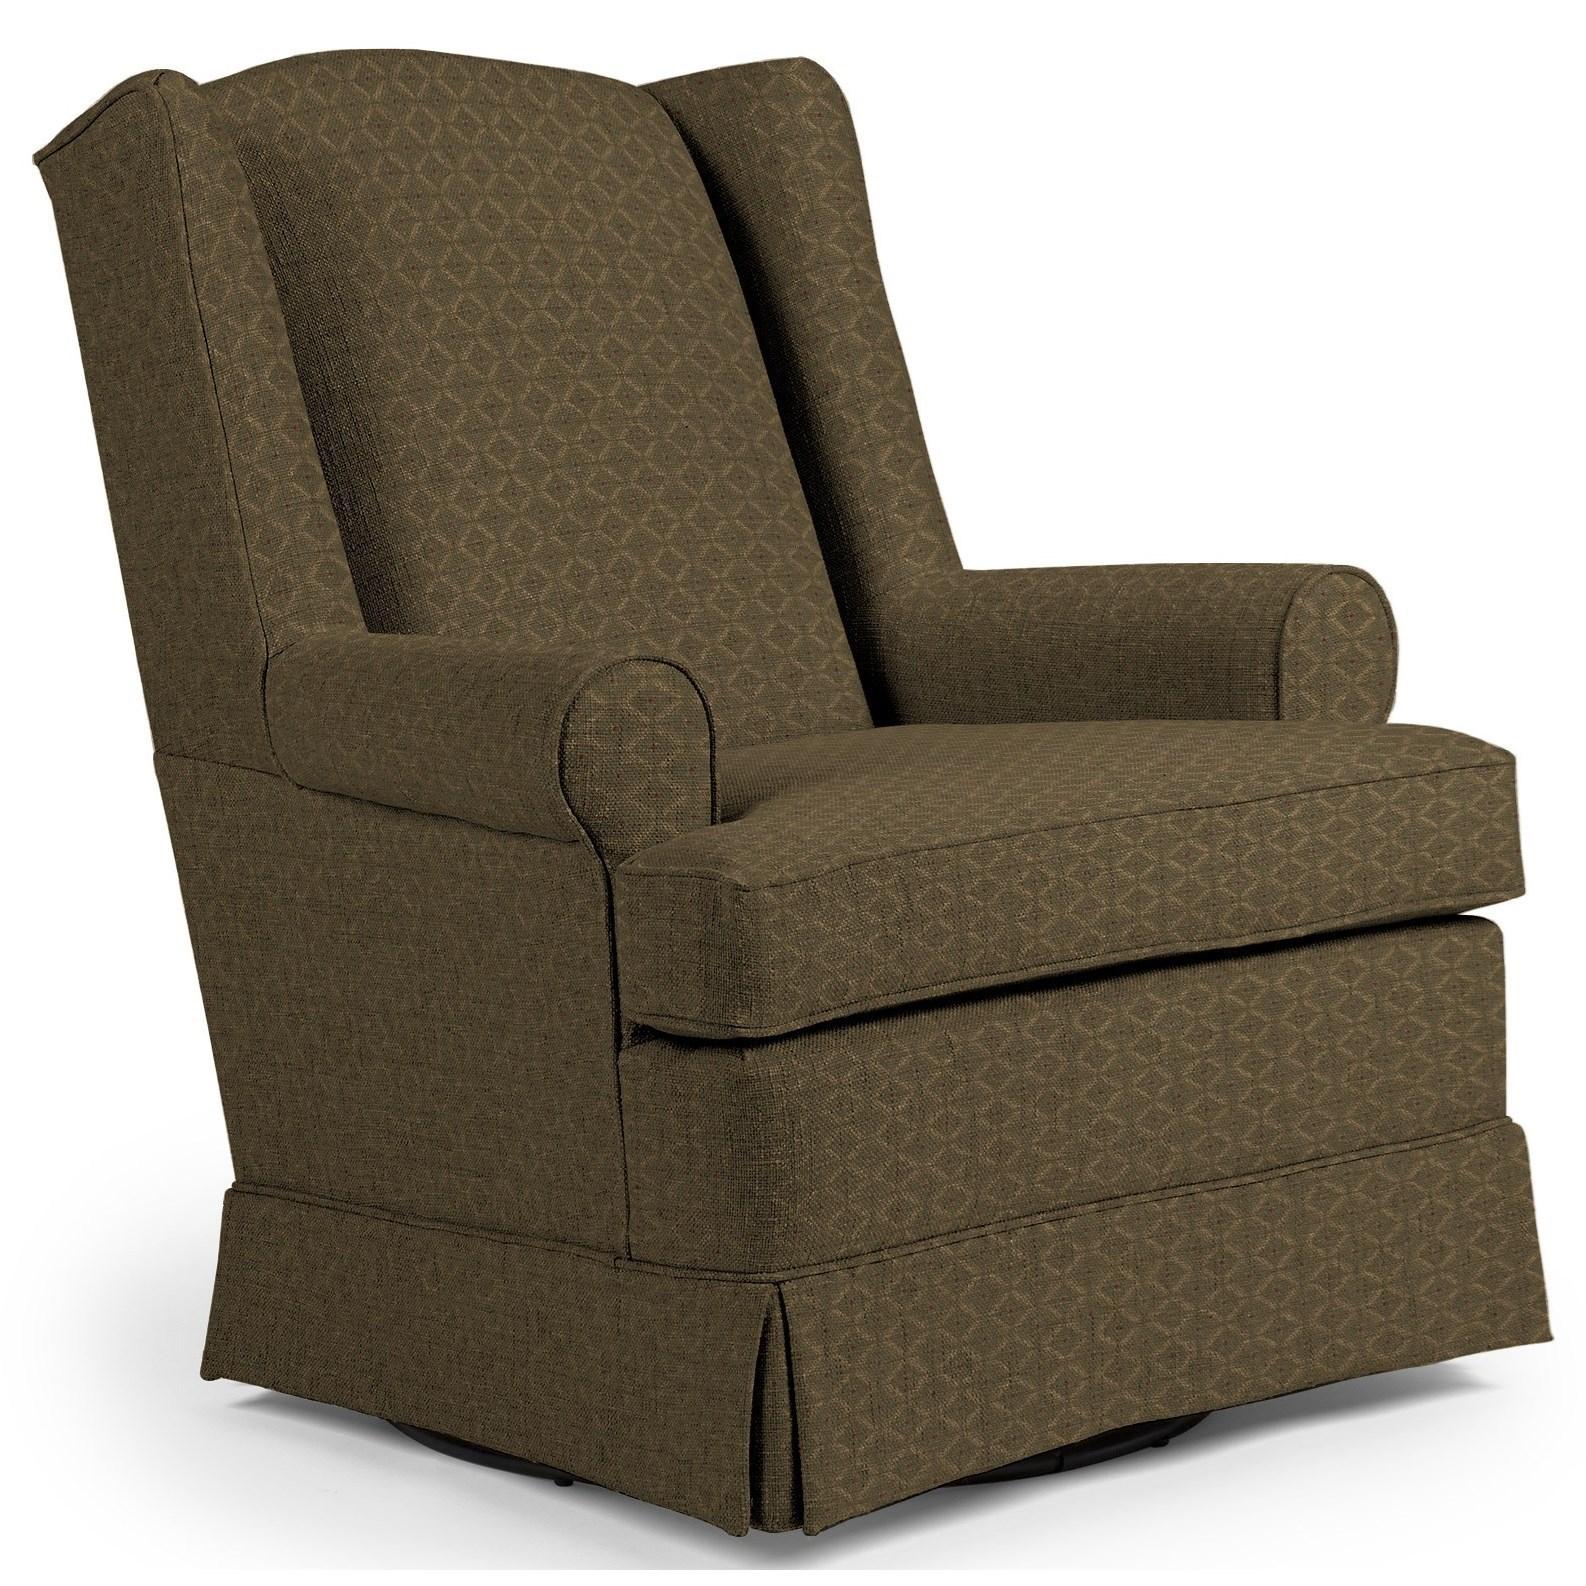 Swivel Glide Chairs Roni Swivel Glider Chair